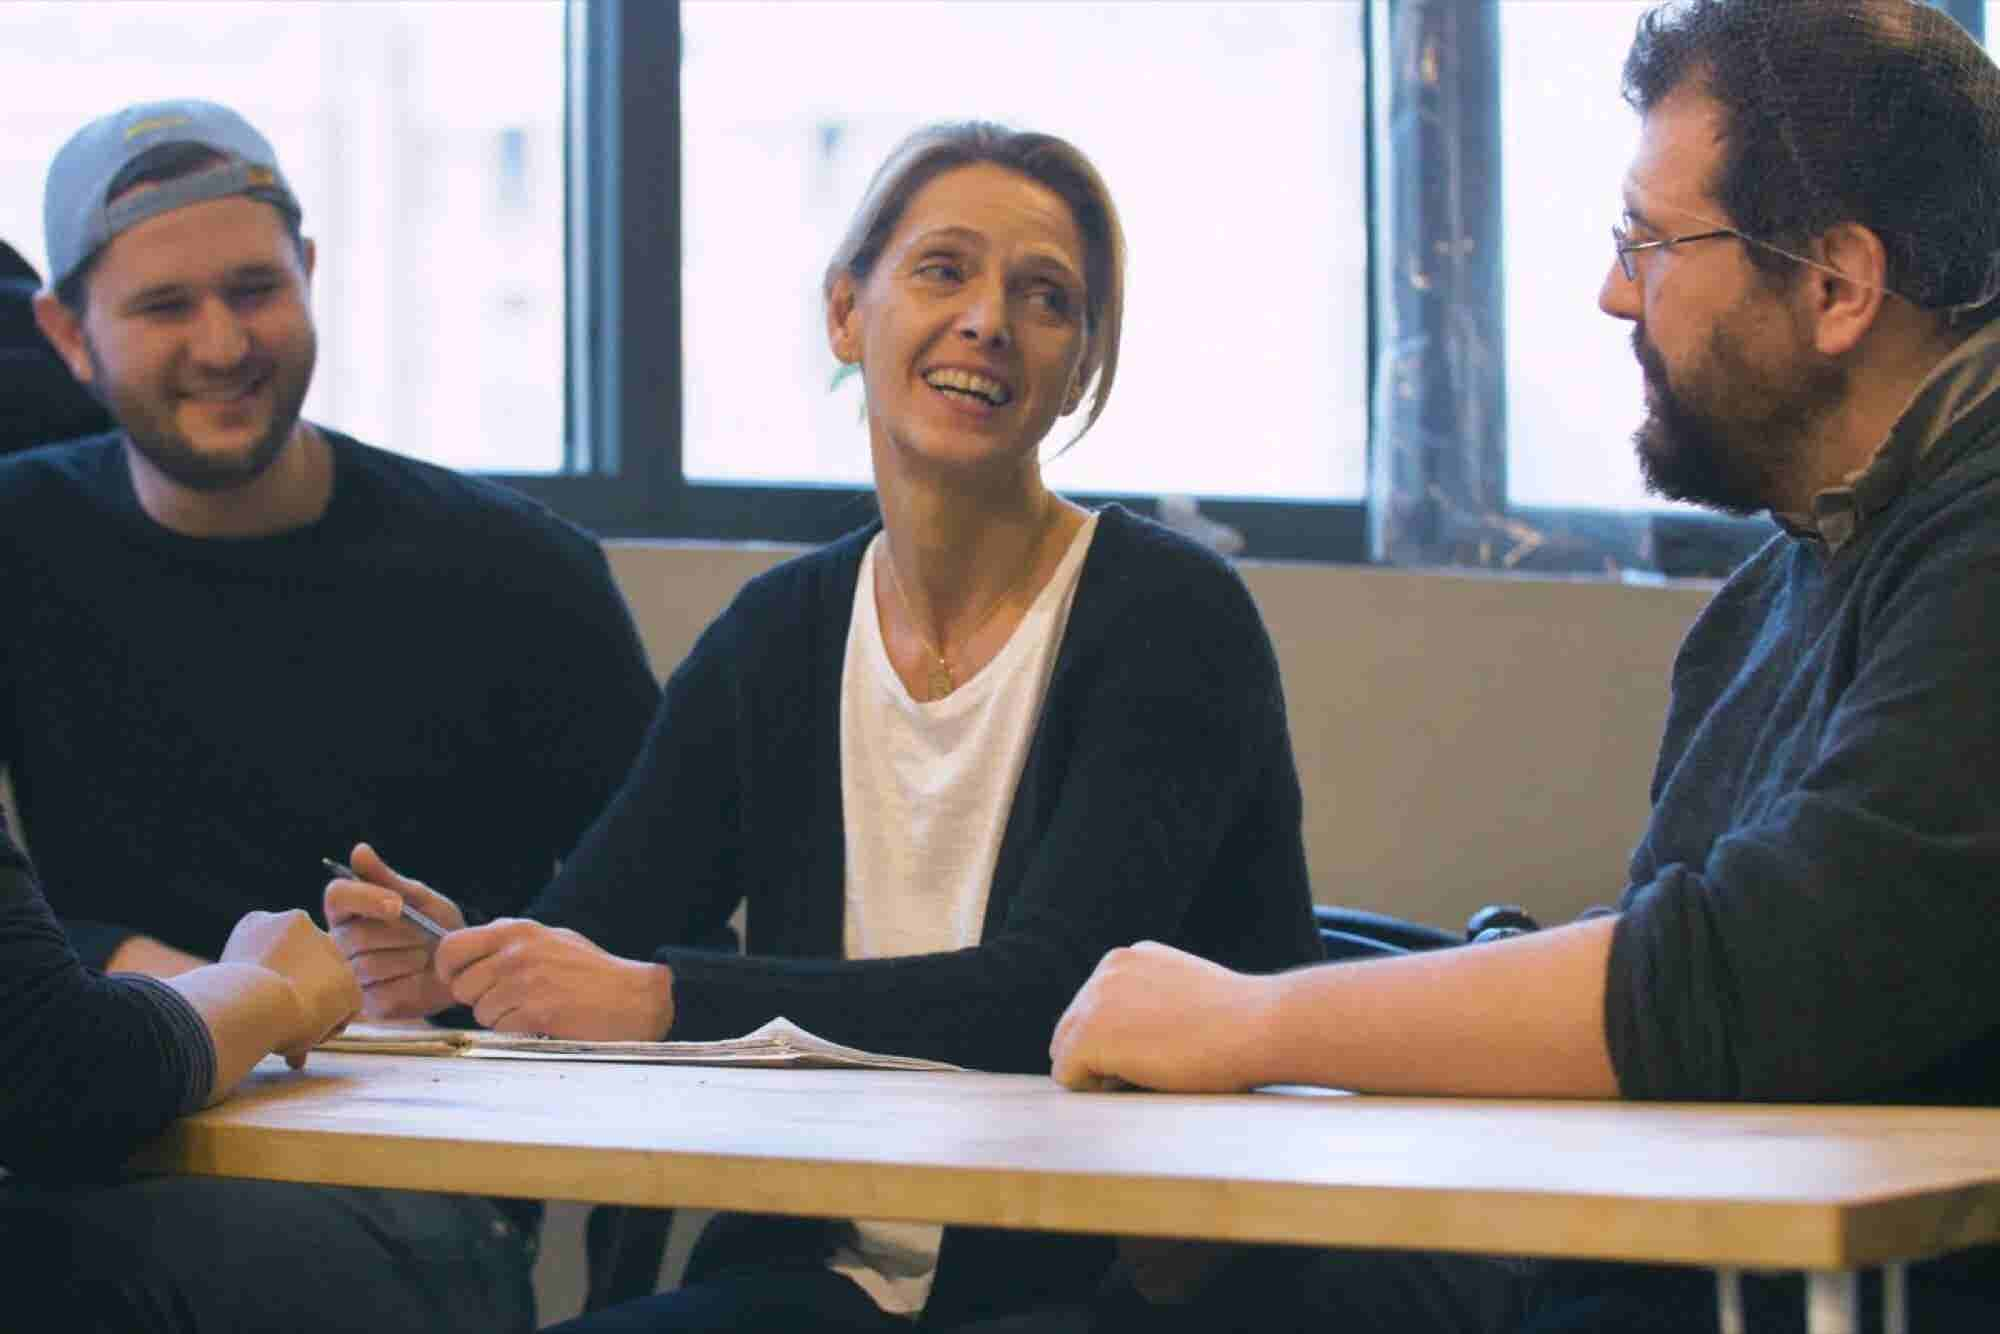 This Entrepreneur's Leadership Success Secret Is Simpler Than You Think